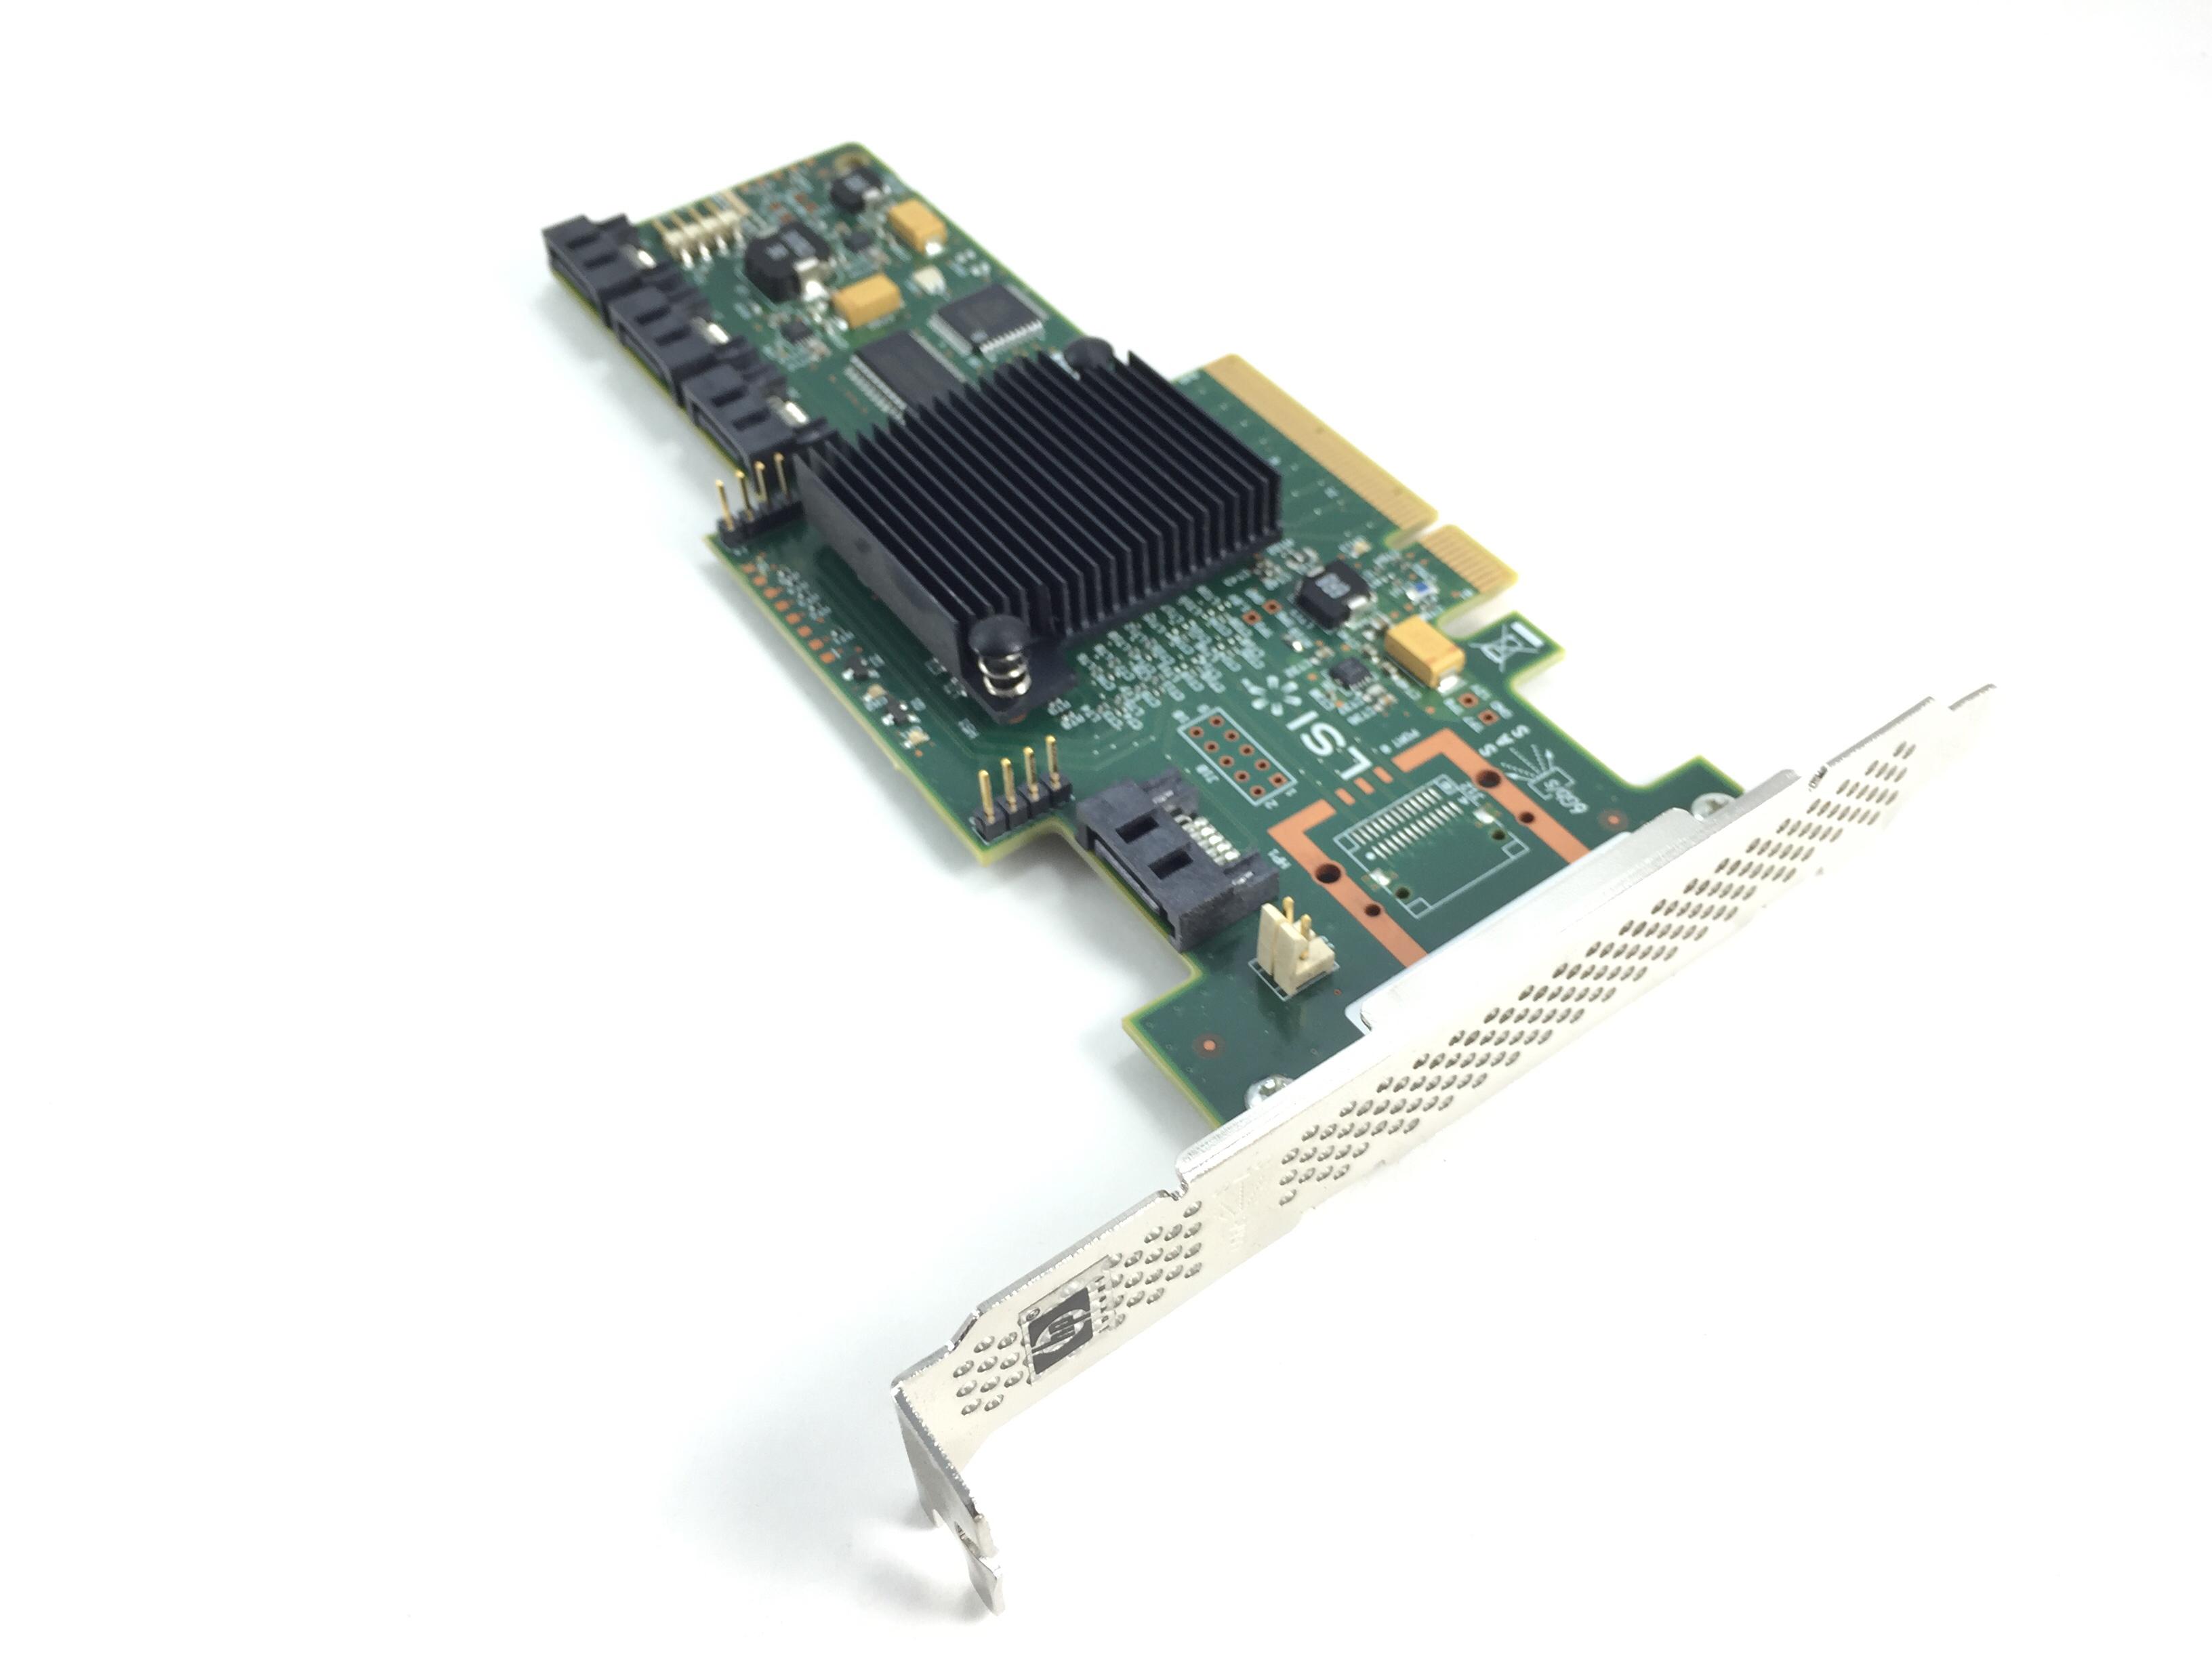 HP Lsi 9212-4I 4 Port PCI-E X8 6Gbps SAS/SATA Host Bus Adapter (689576-001)